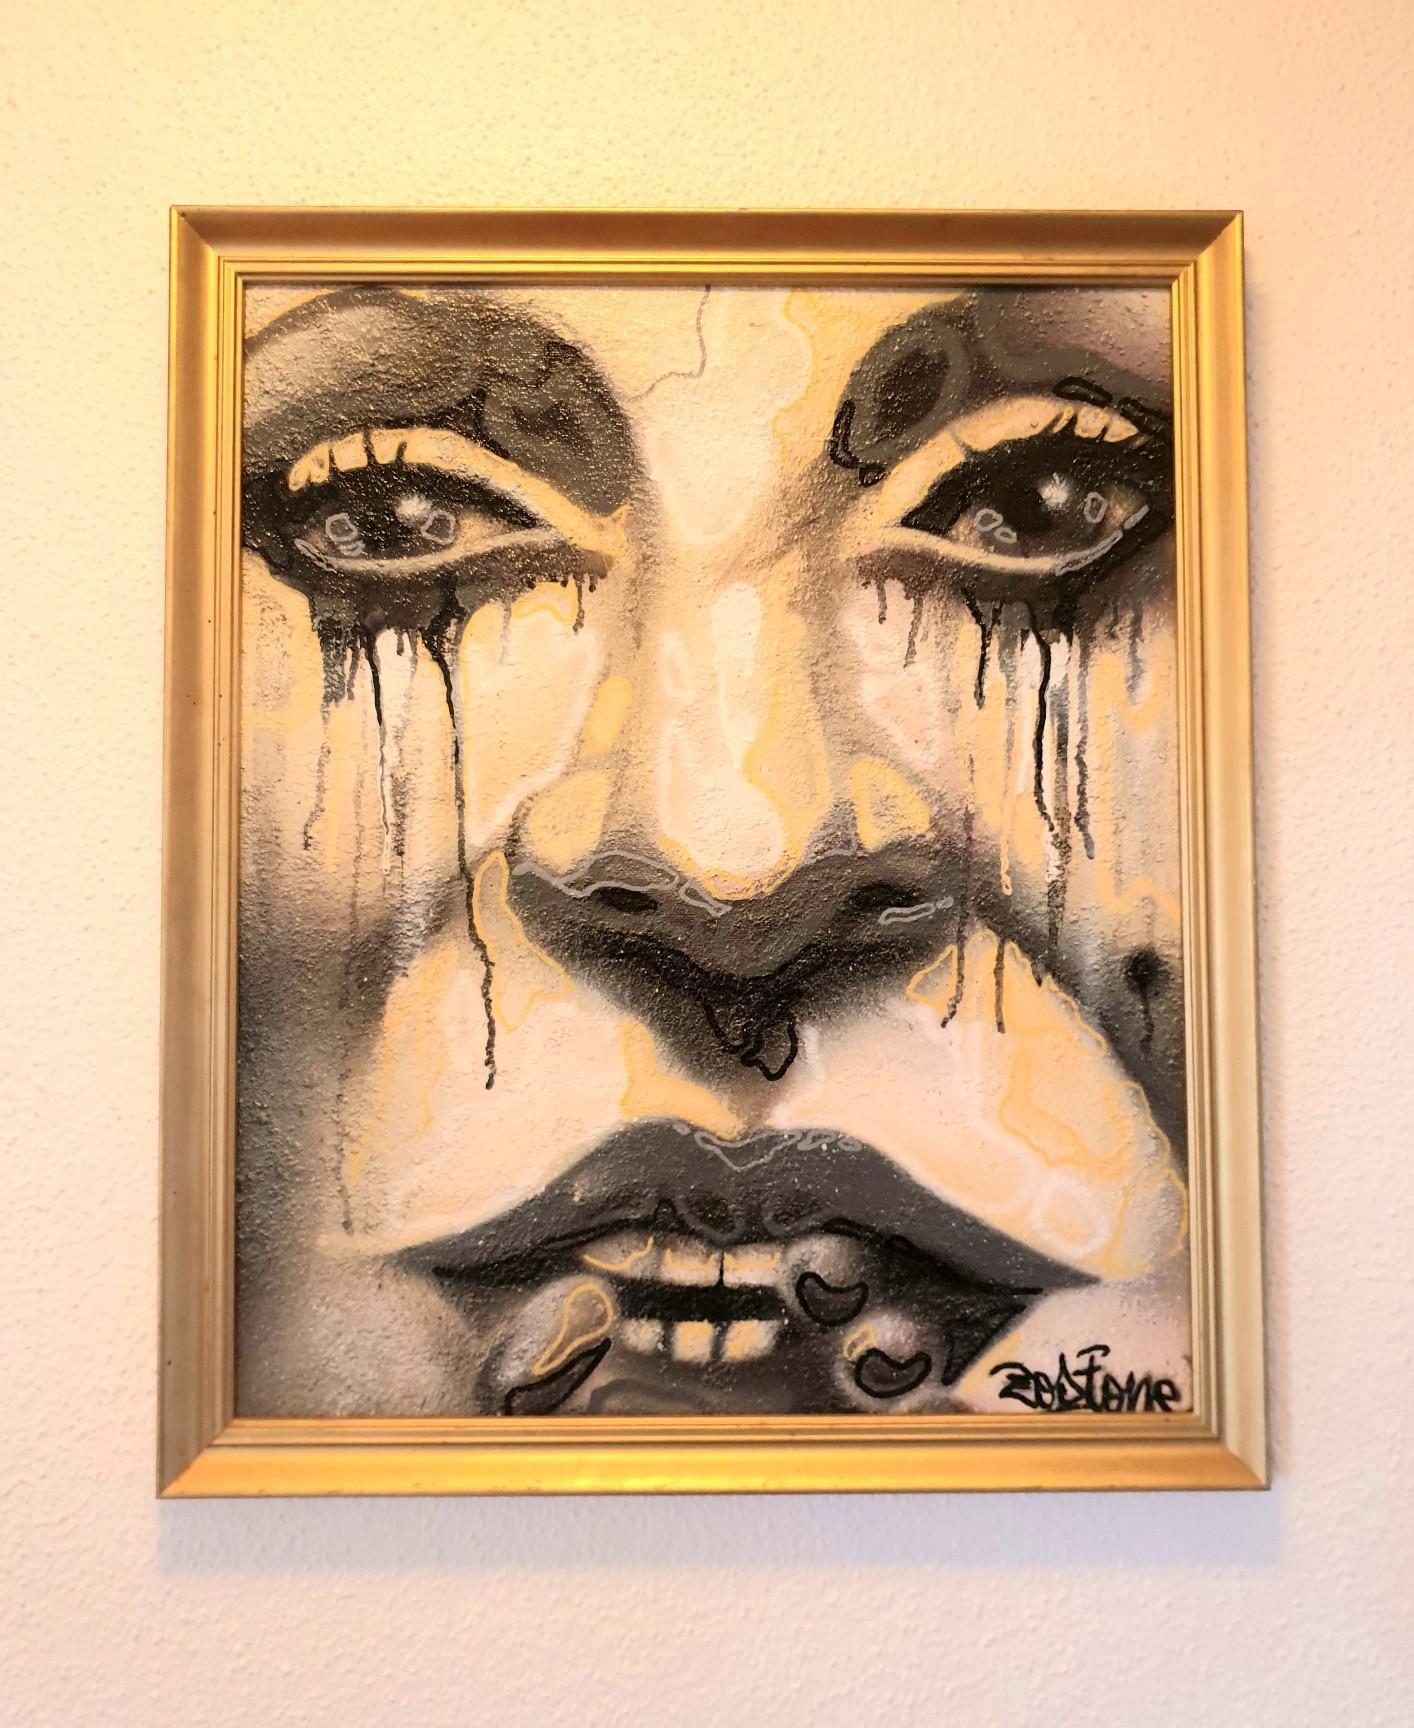 artigall: Marilyn Gemälde Eostone